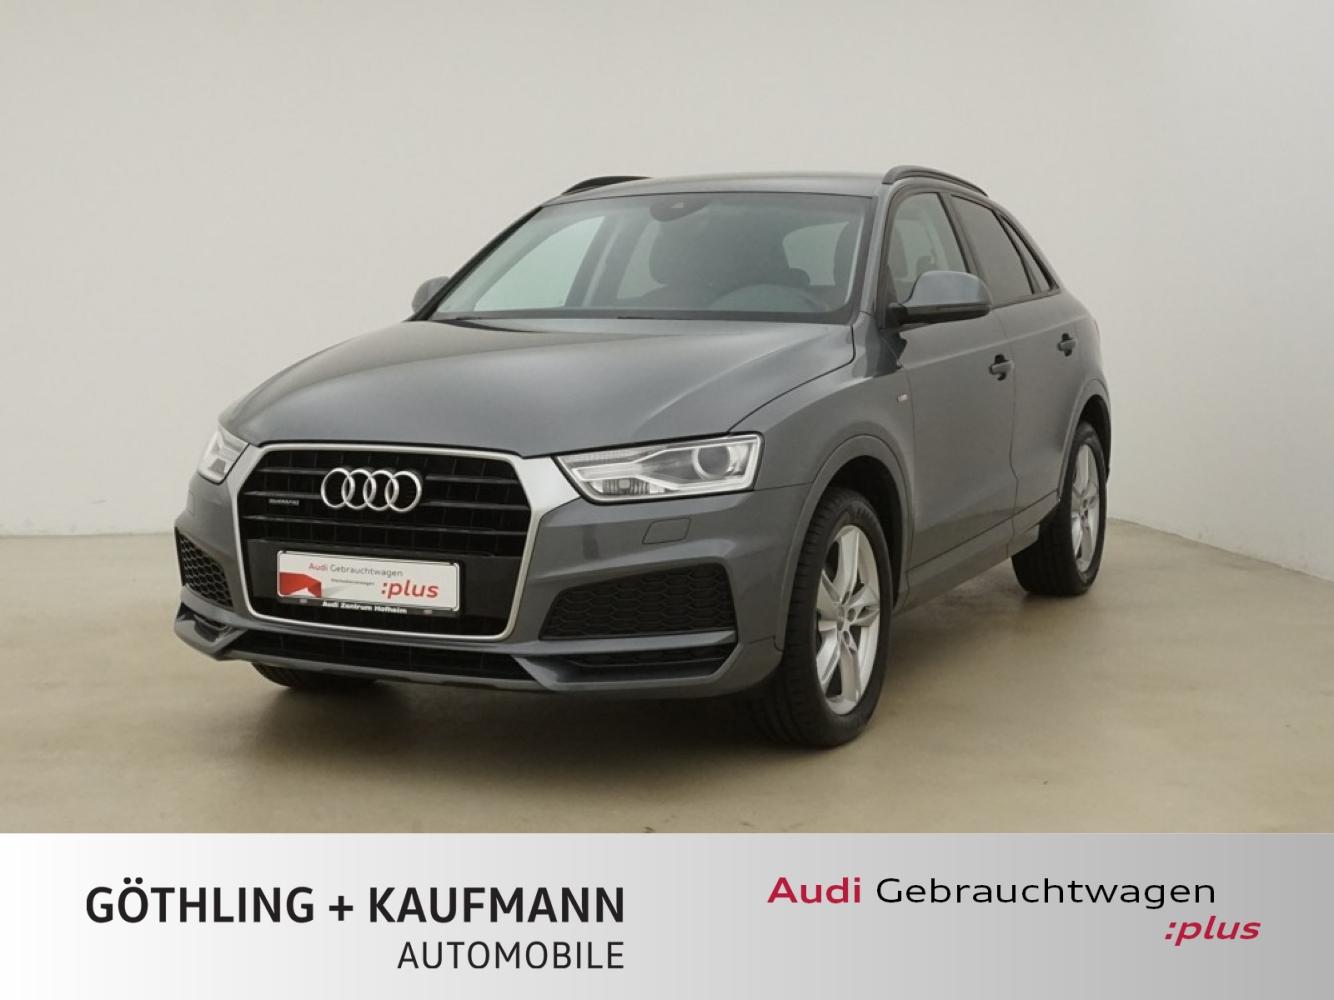 Audi Q3 2.0 TDI qu S line S tro. 110kW*Bose*Xenon+*Co, Jahr 2017, Diesel